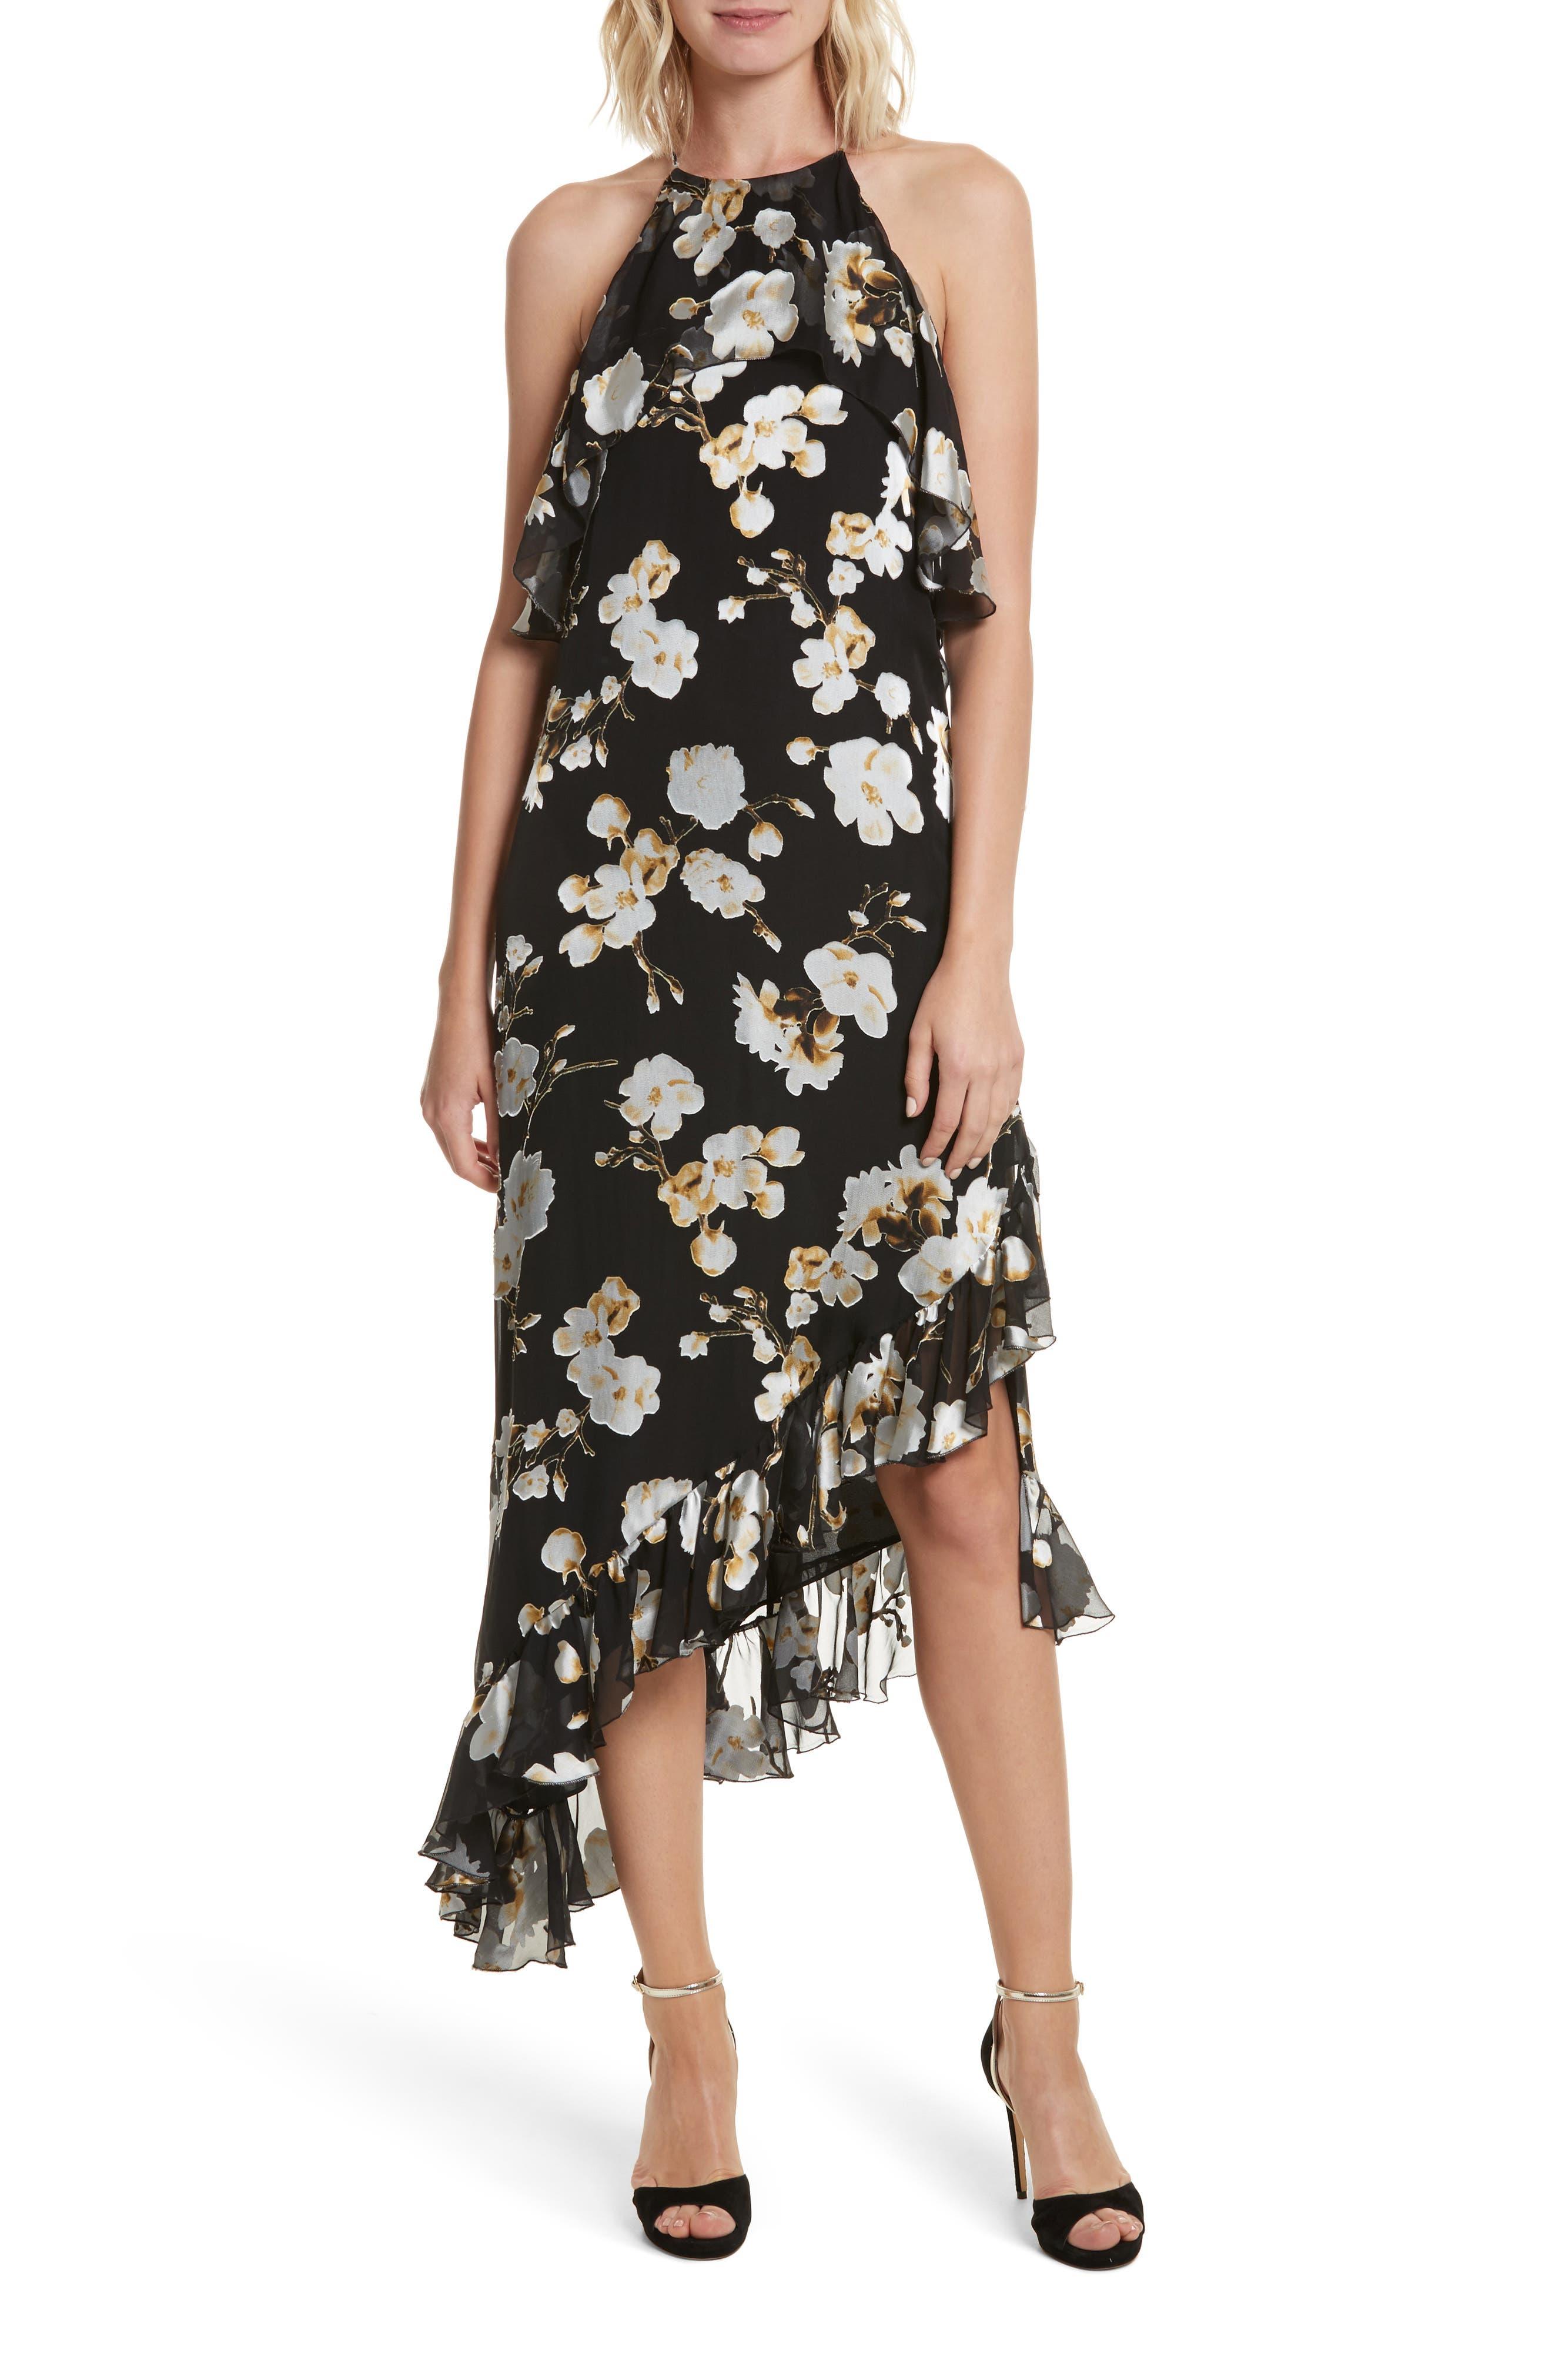 Alternate Image 1 Selected - Alice + Olivia Fabiola Asymmetrical Ruffle A-Line Dress